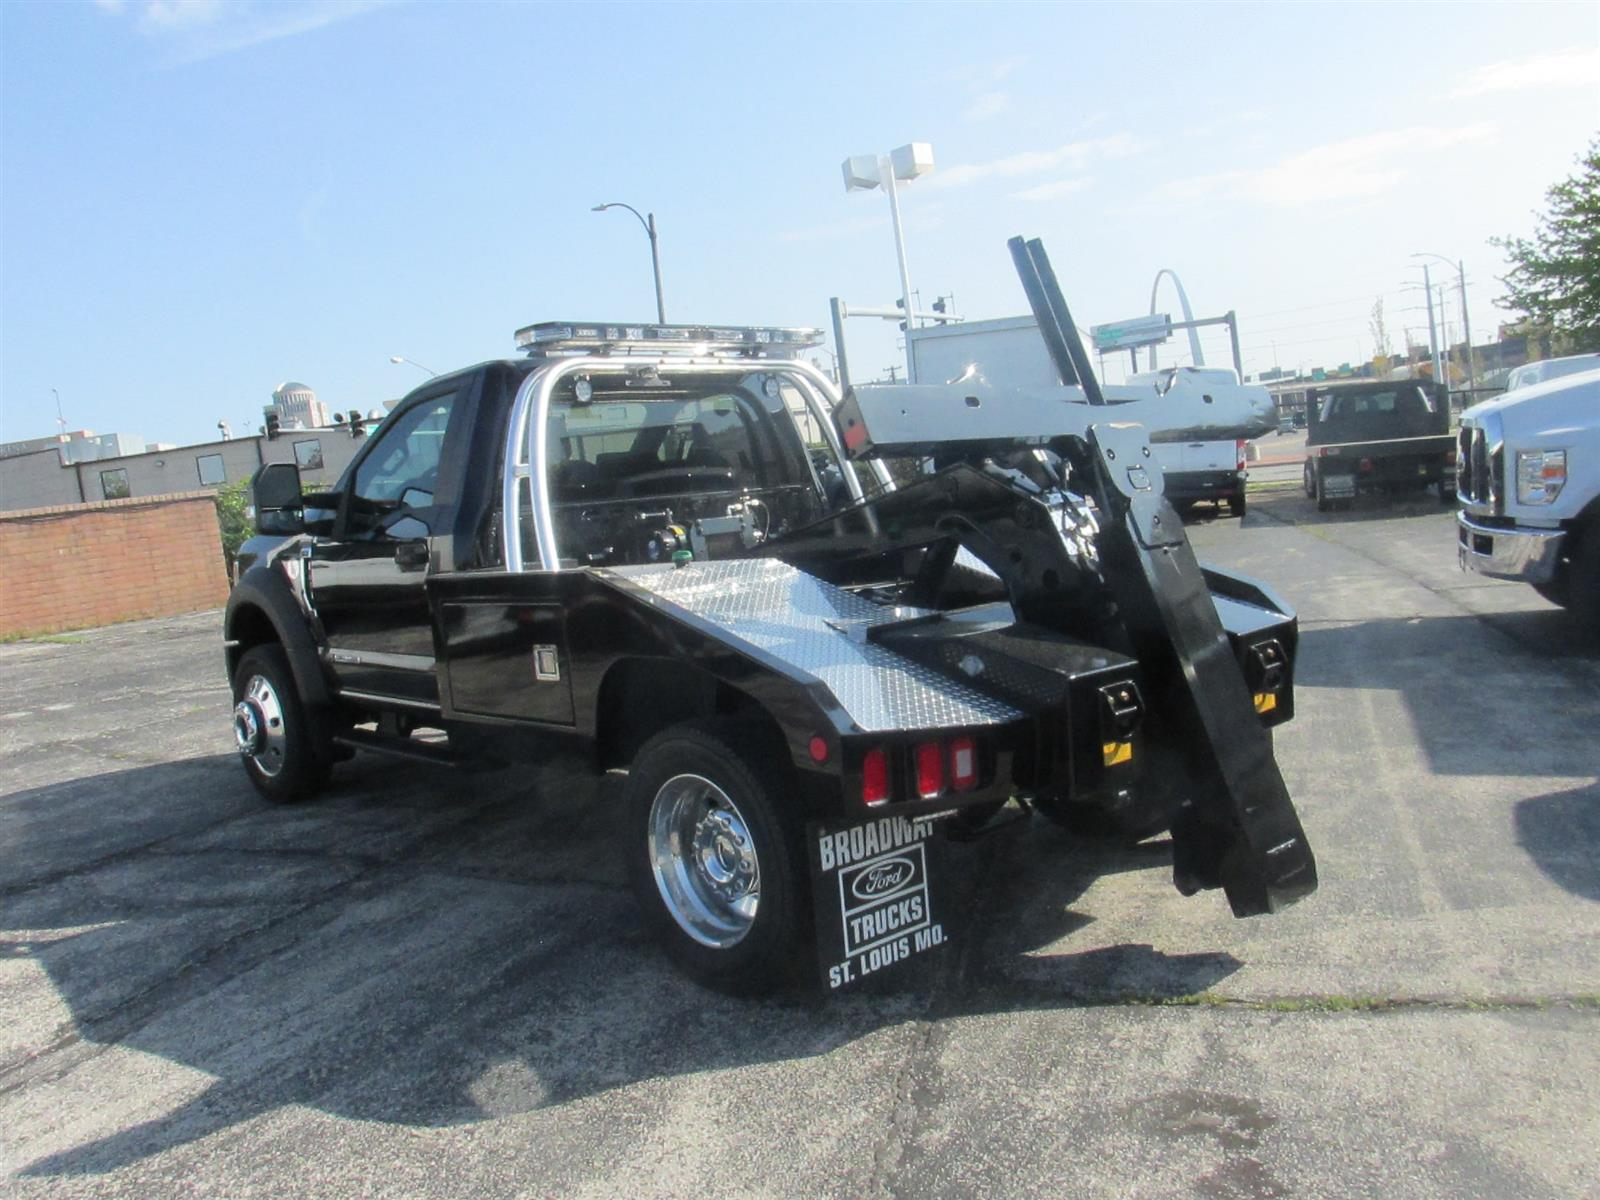 2020 Ford F-450 Regular Cab DRW 4x4, Miller Industries Wrecker Body #4067 - photo 1